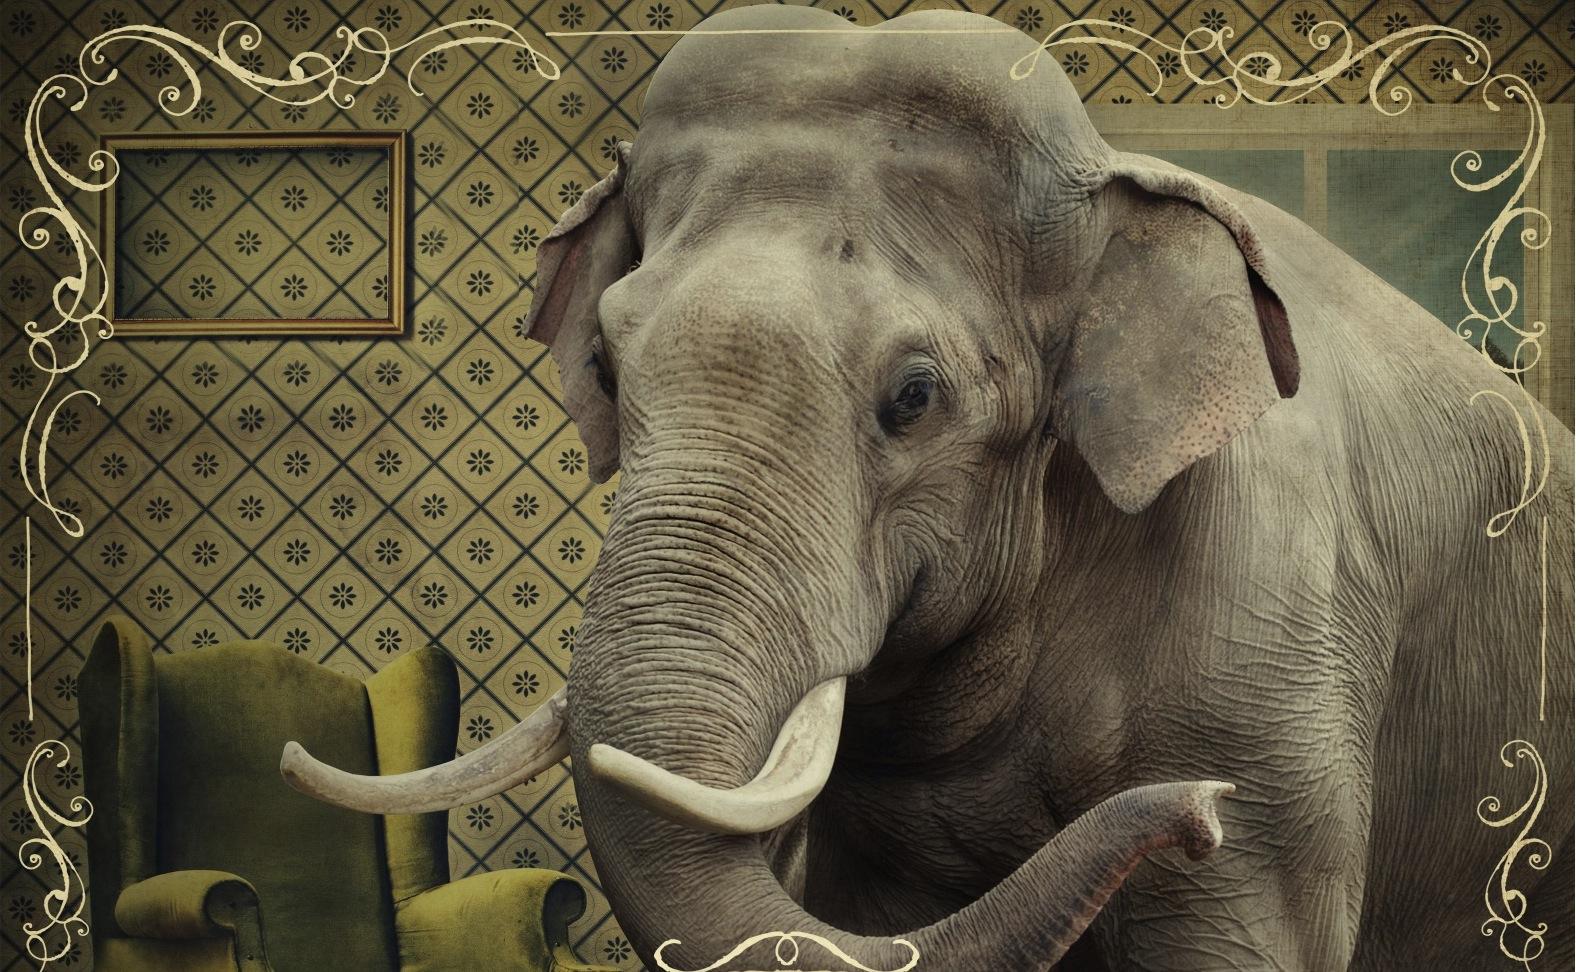 Elephant Room notext.jpg